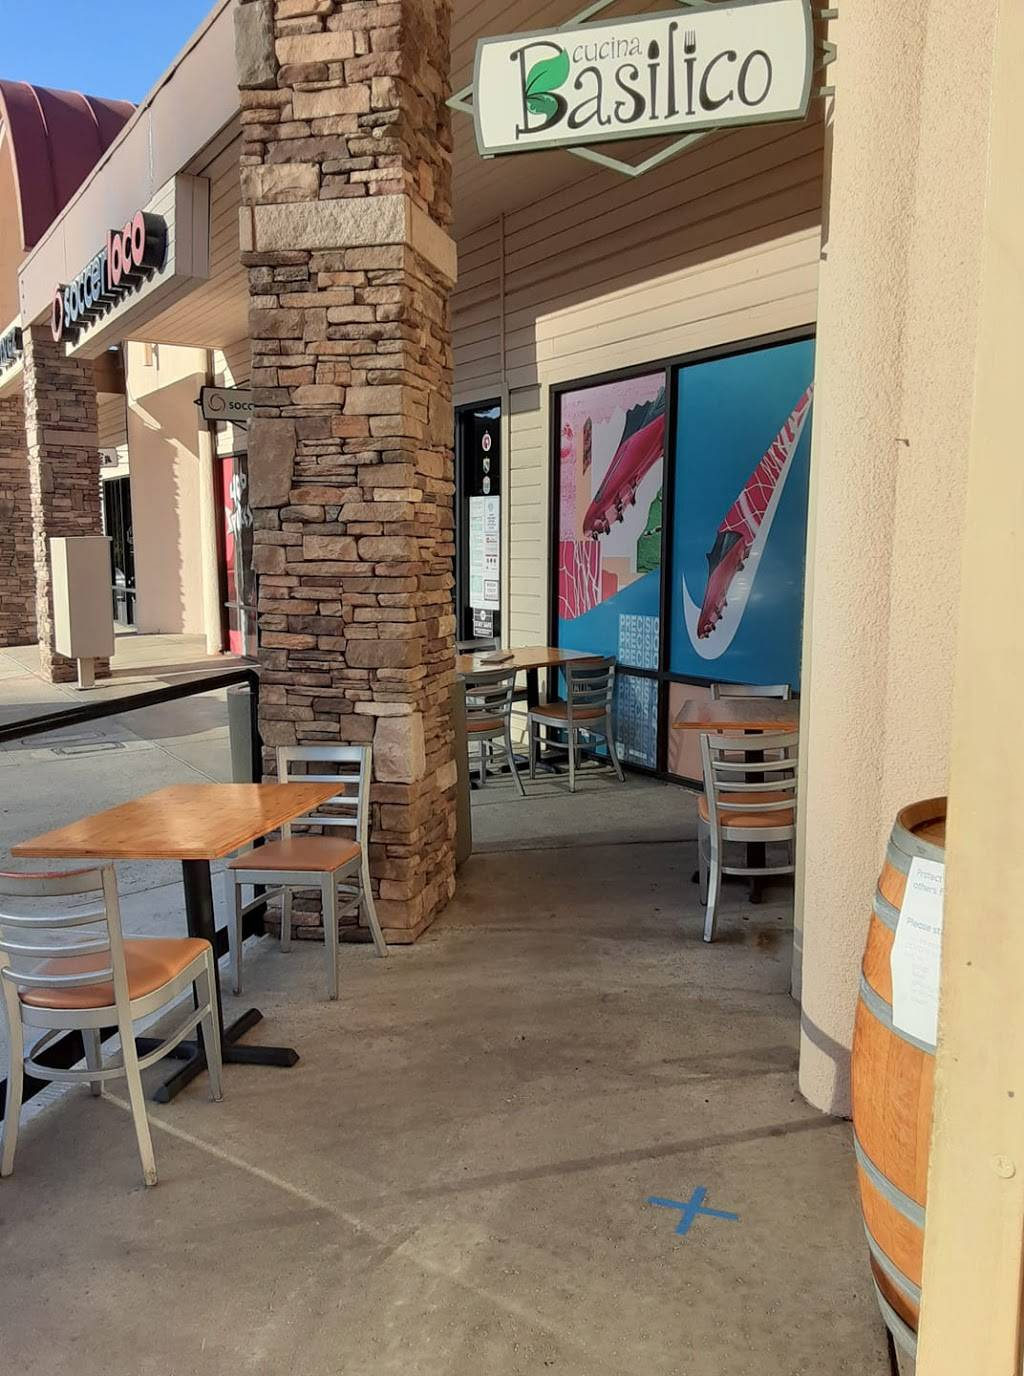 Cucina Basilico - restaurant  | Photo 7 of 8 | Address: 3755 Murphy Canyon Rd, San Diego, CA 92123, USA | Phone: (858) 874-6436